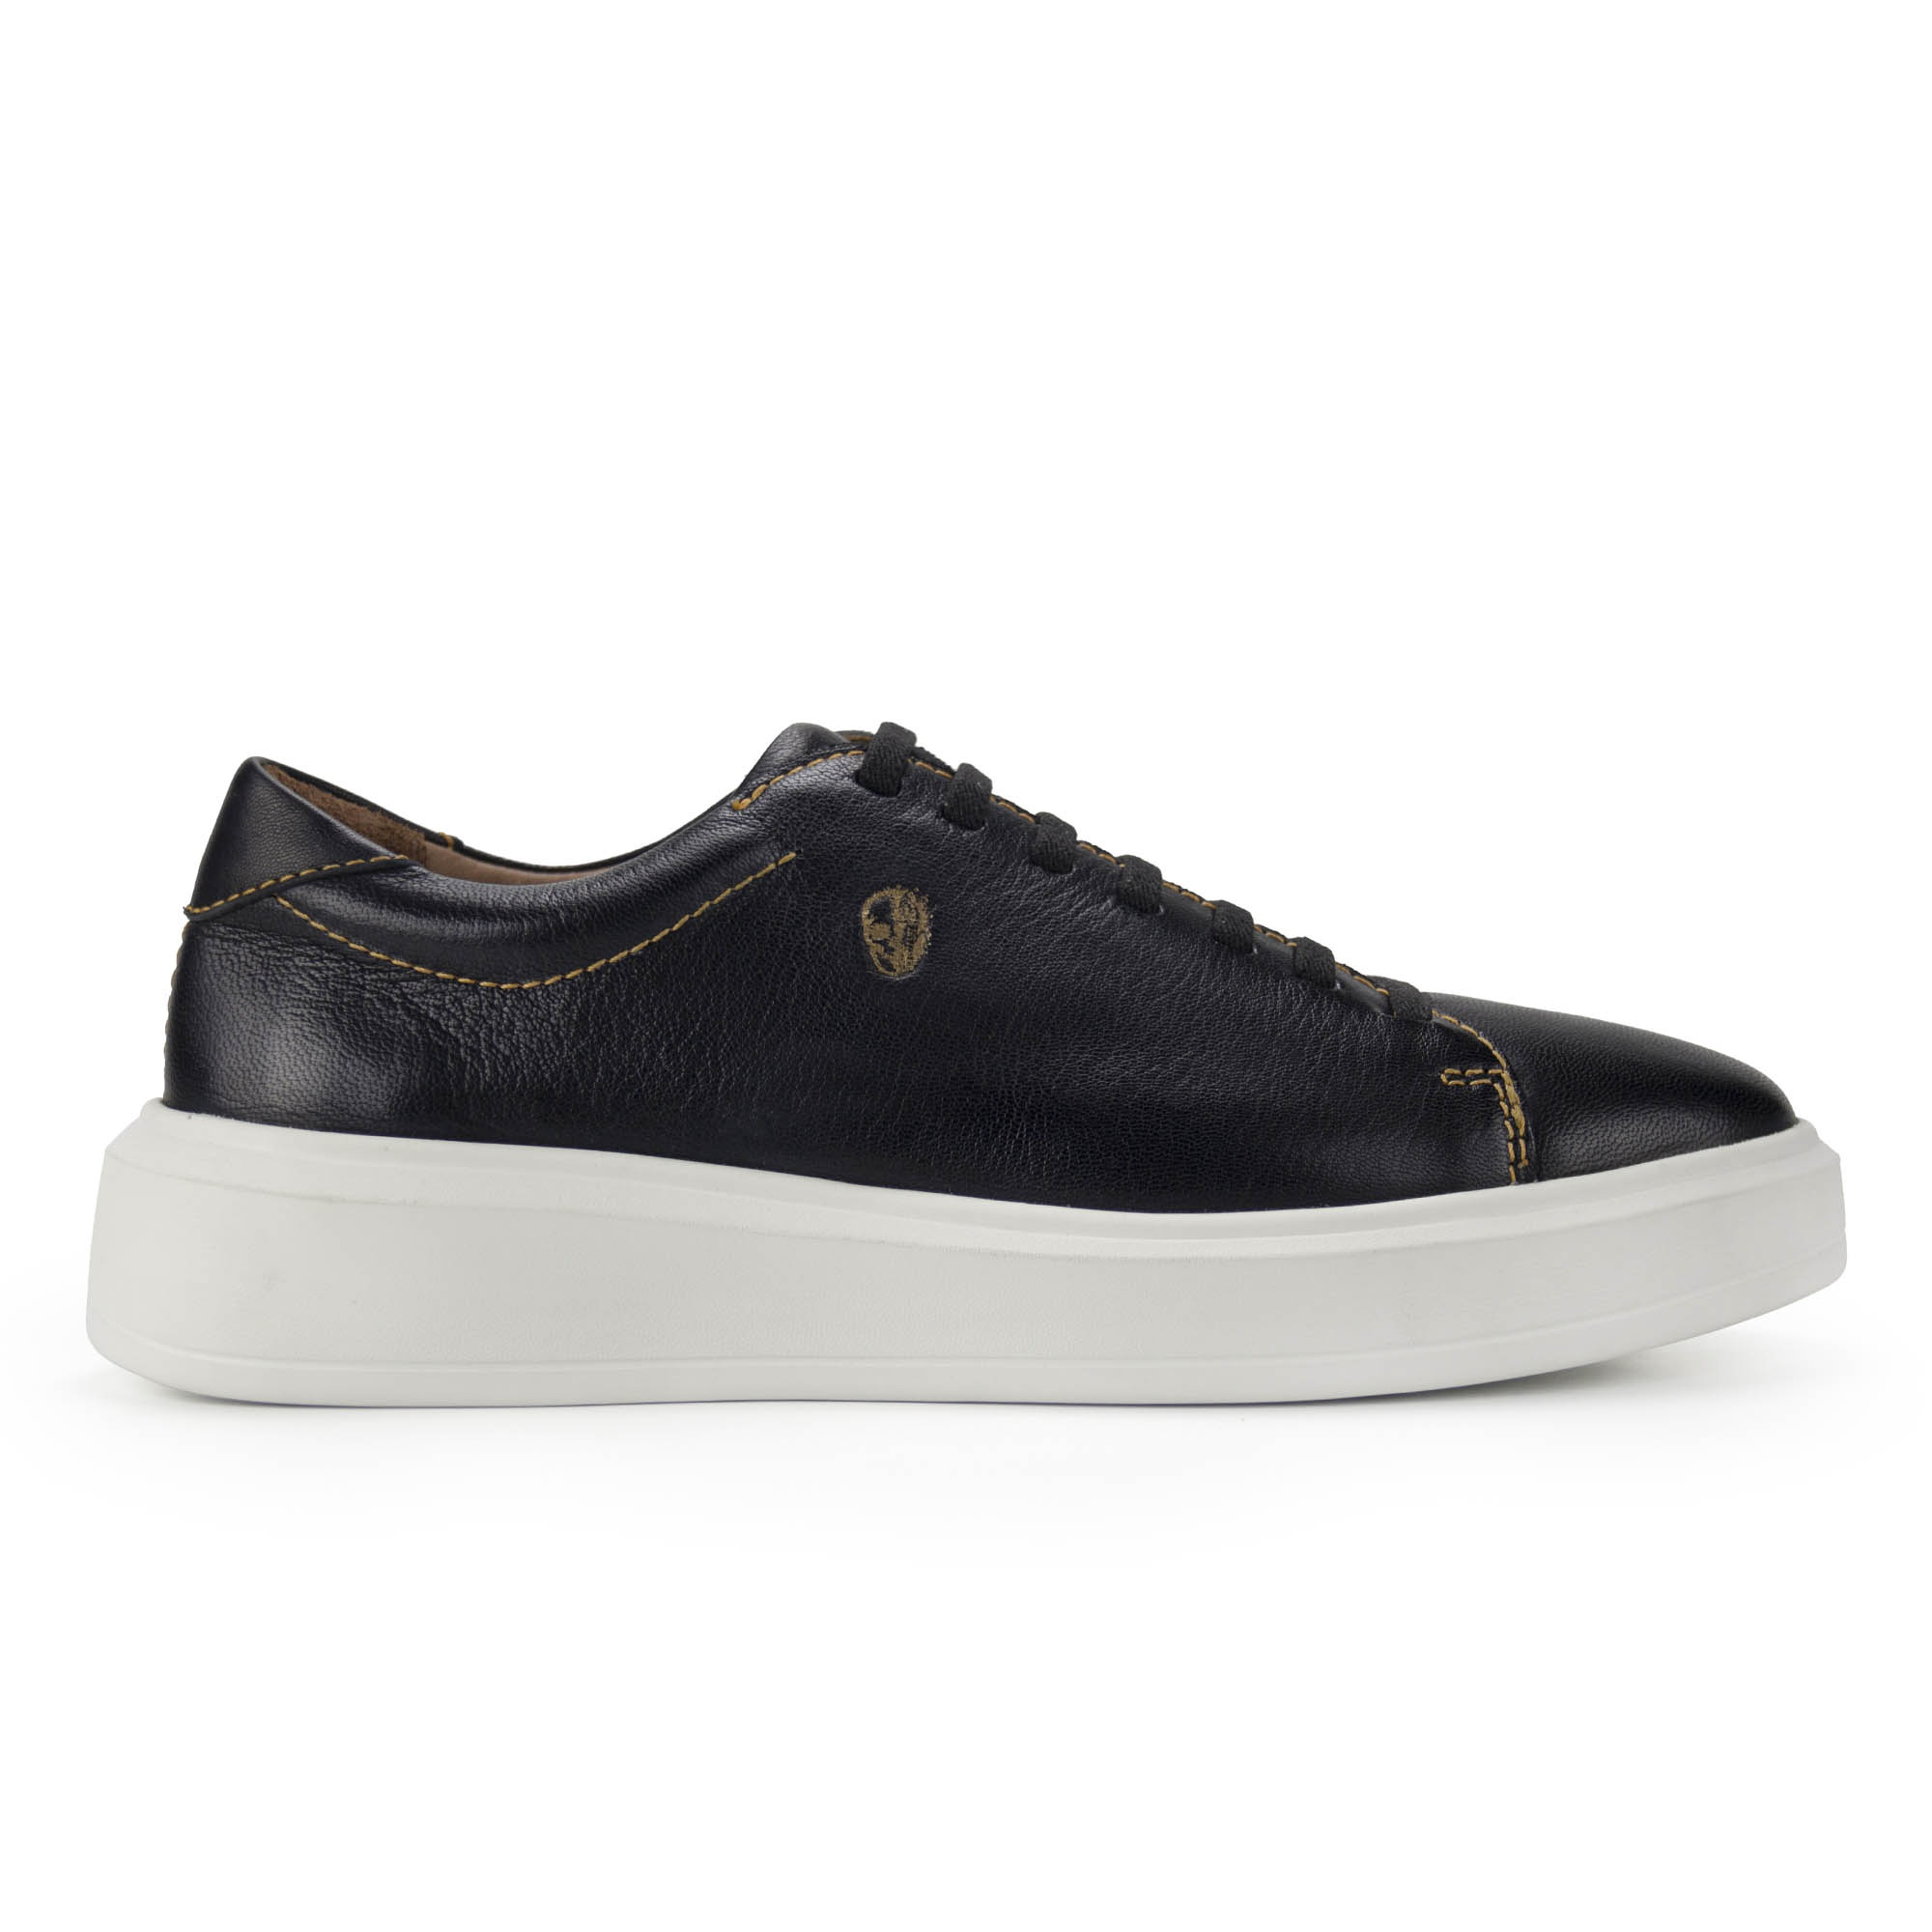 Sneaker Masculino Vinis preto